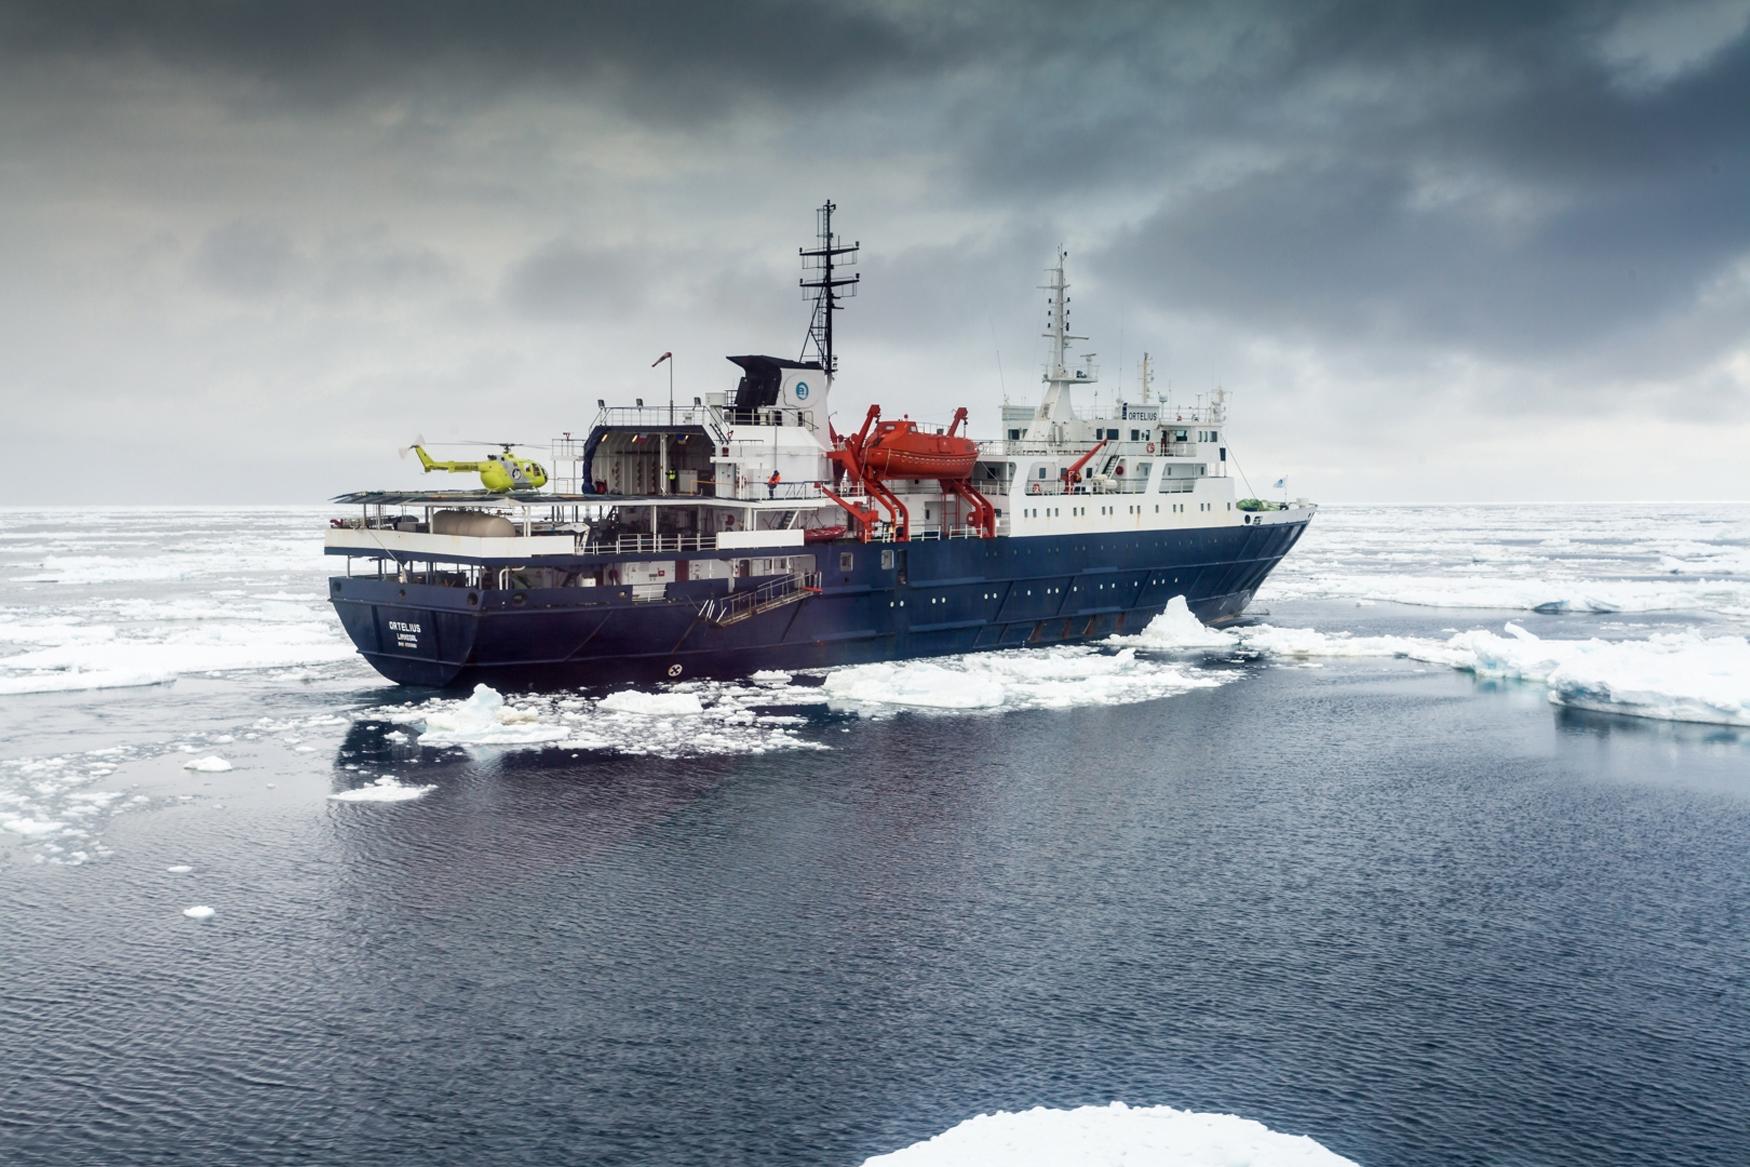 Helicopter, Ortelius, Ross Sea, Antarctica, March